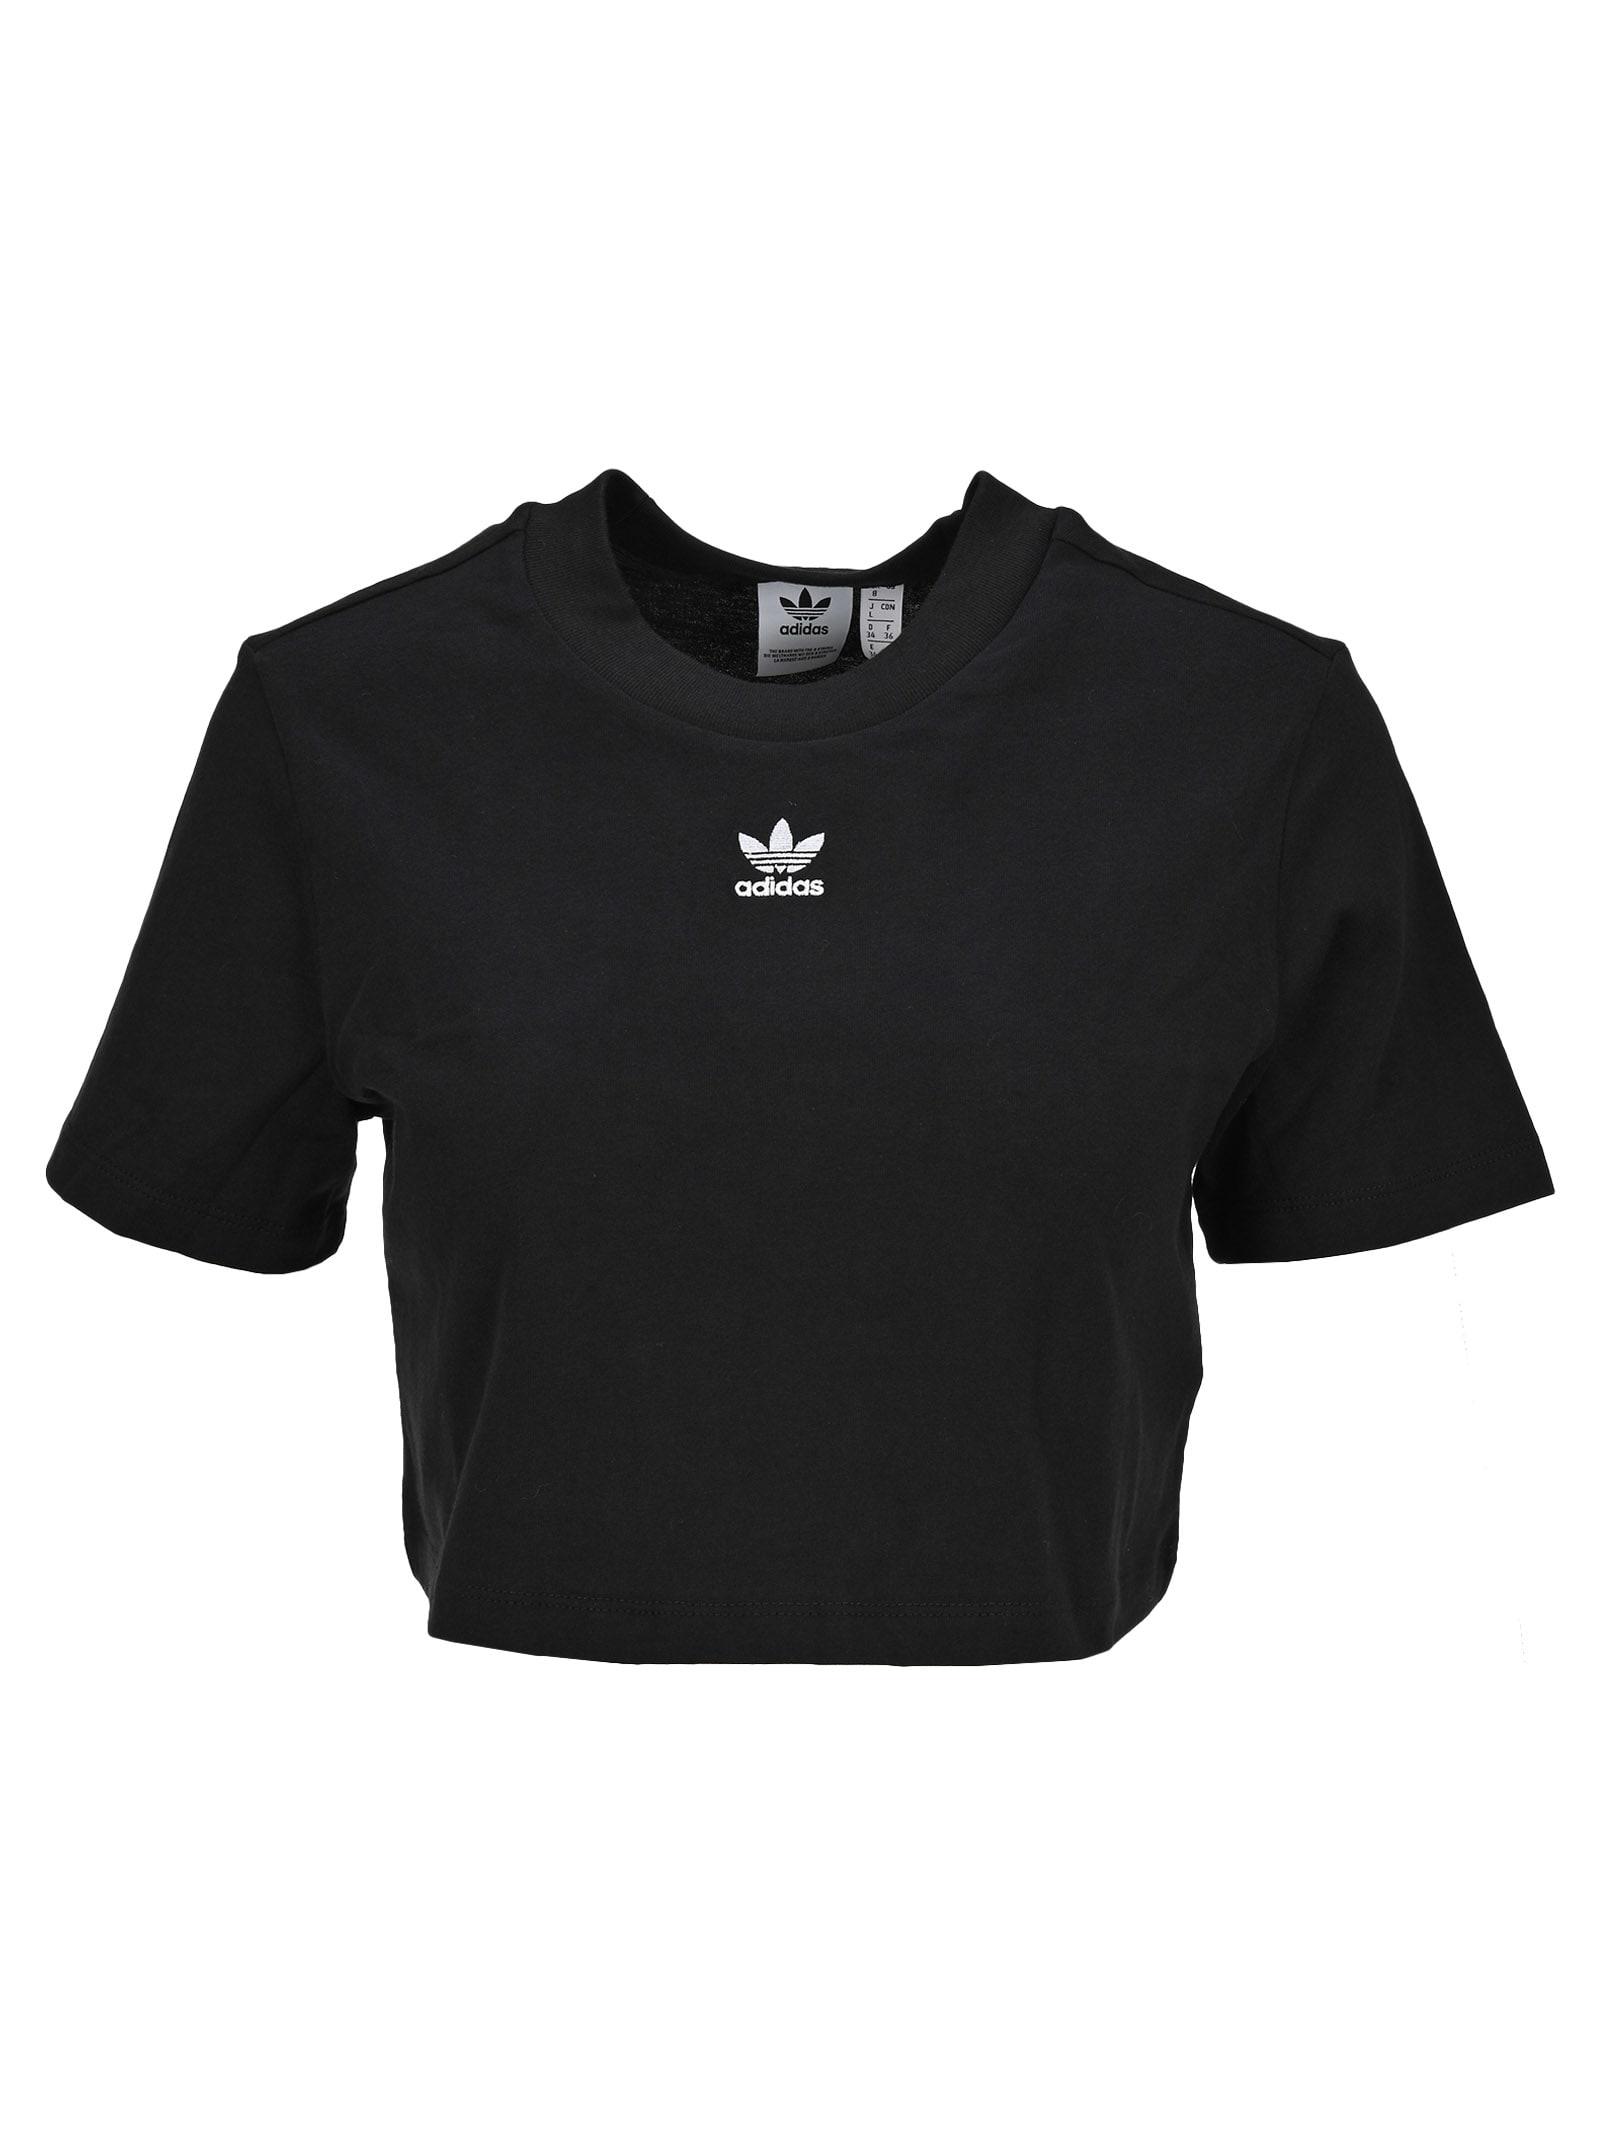 Adidas Originals Trefoil Essentials Cropped T-shirt